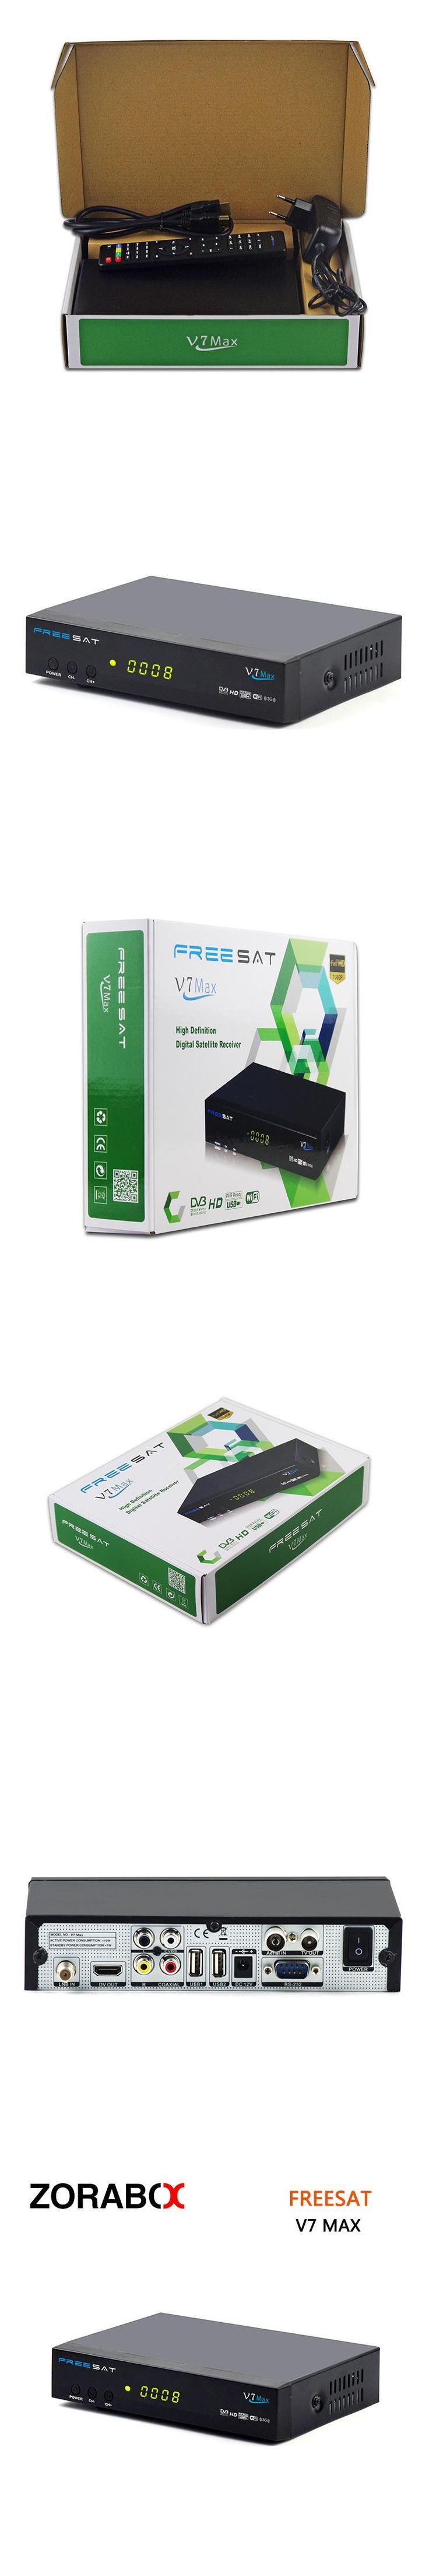 [GENUINE] FTA digital satellite receiver FREESAT v7 max  dvb-S/S2 full 1080p  HD  tv receiver support powervu Dre&bisskey cccam